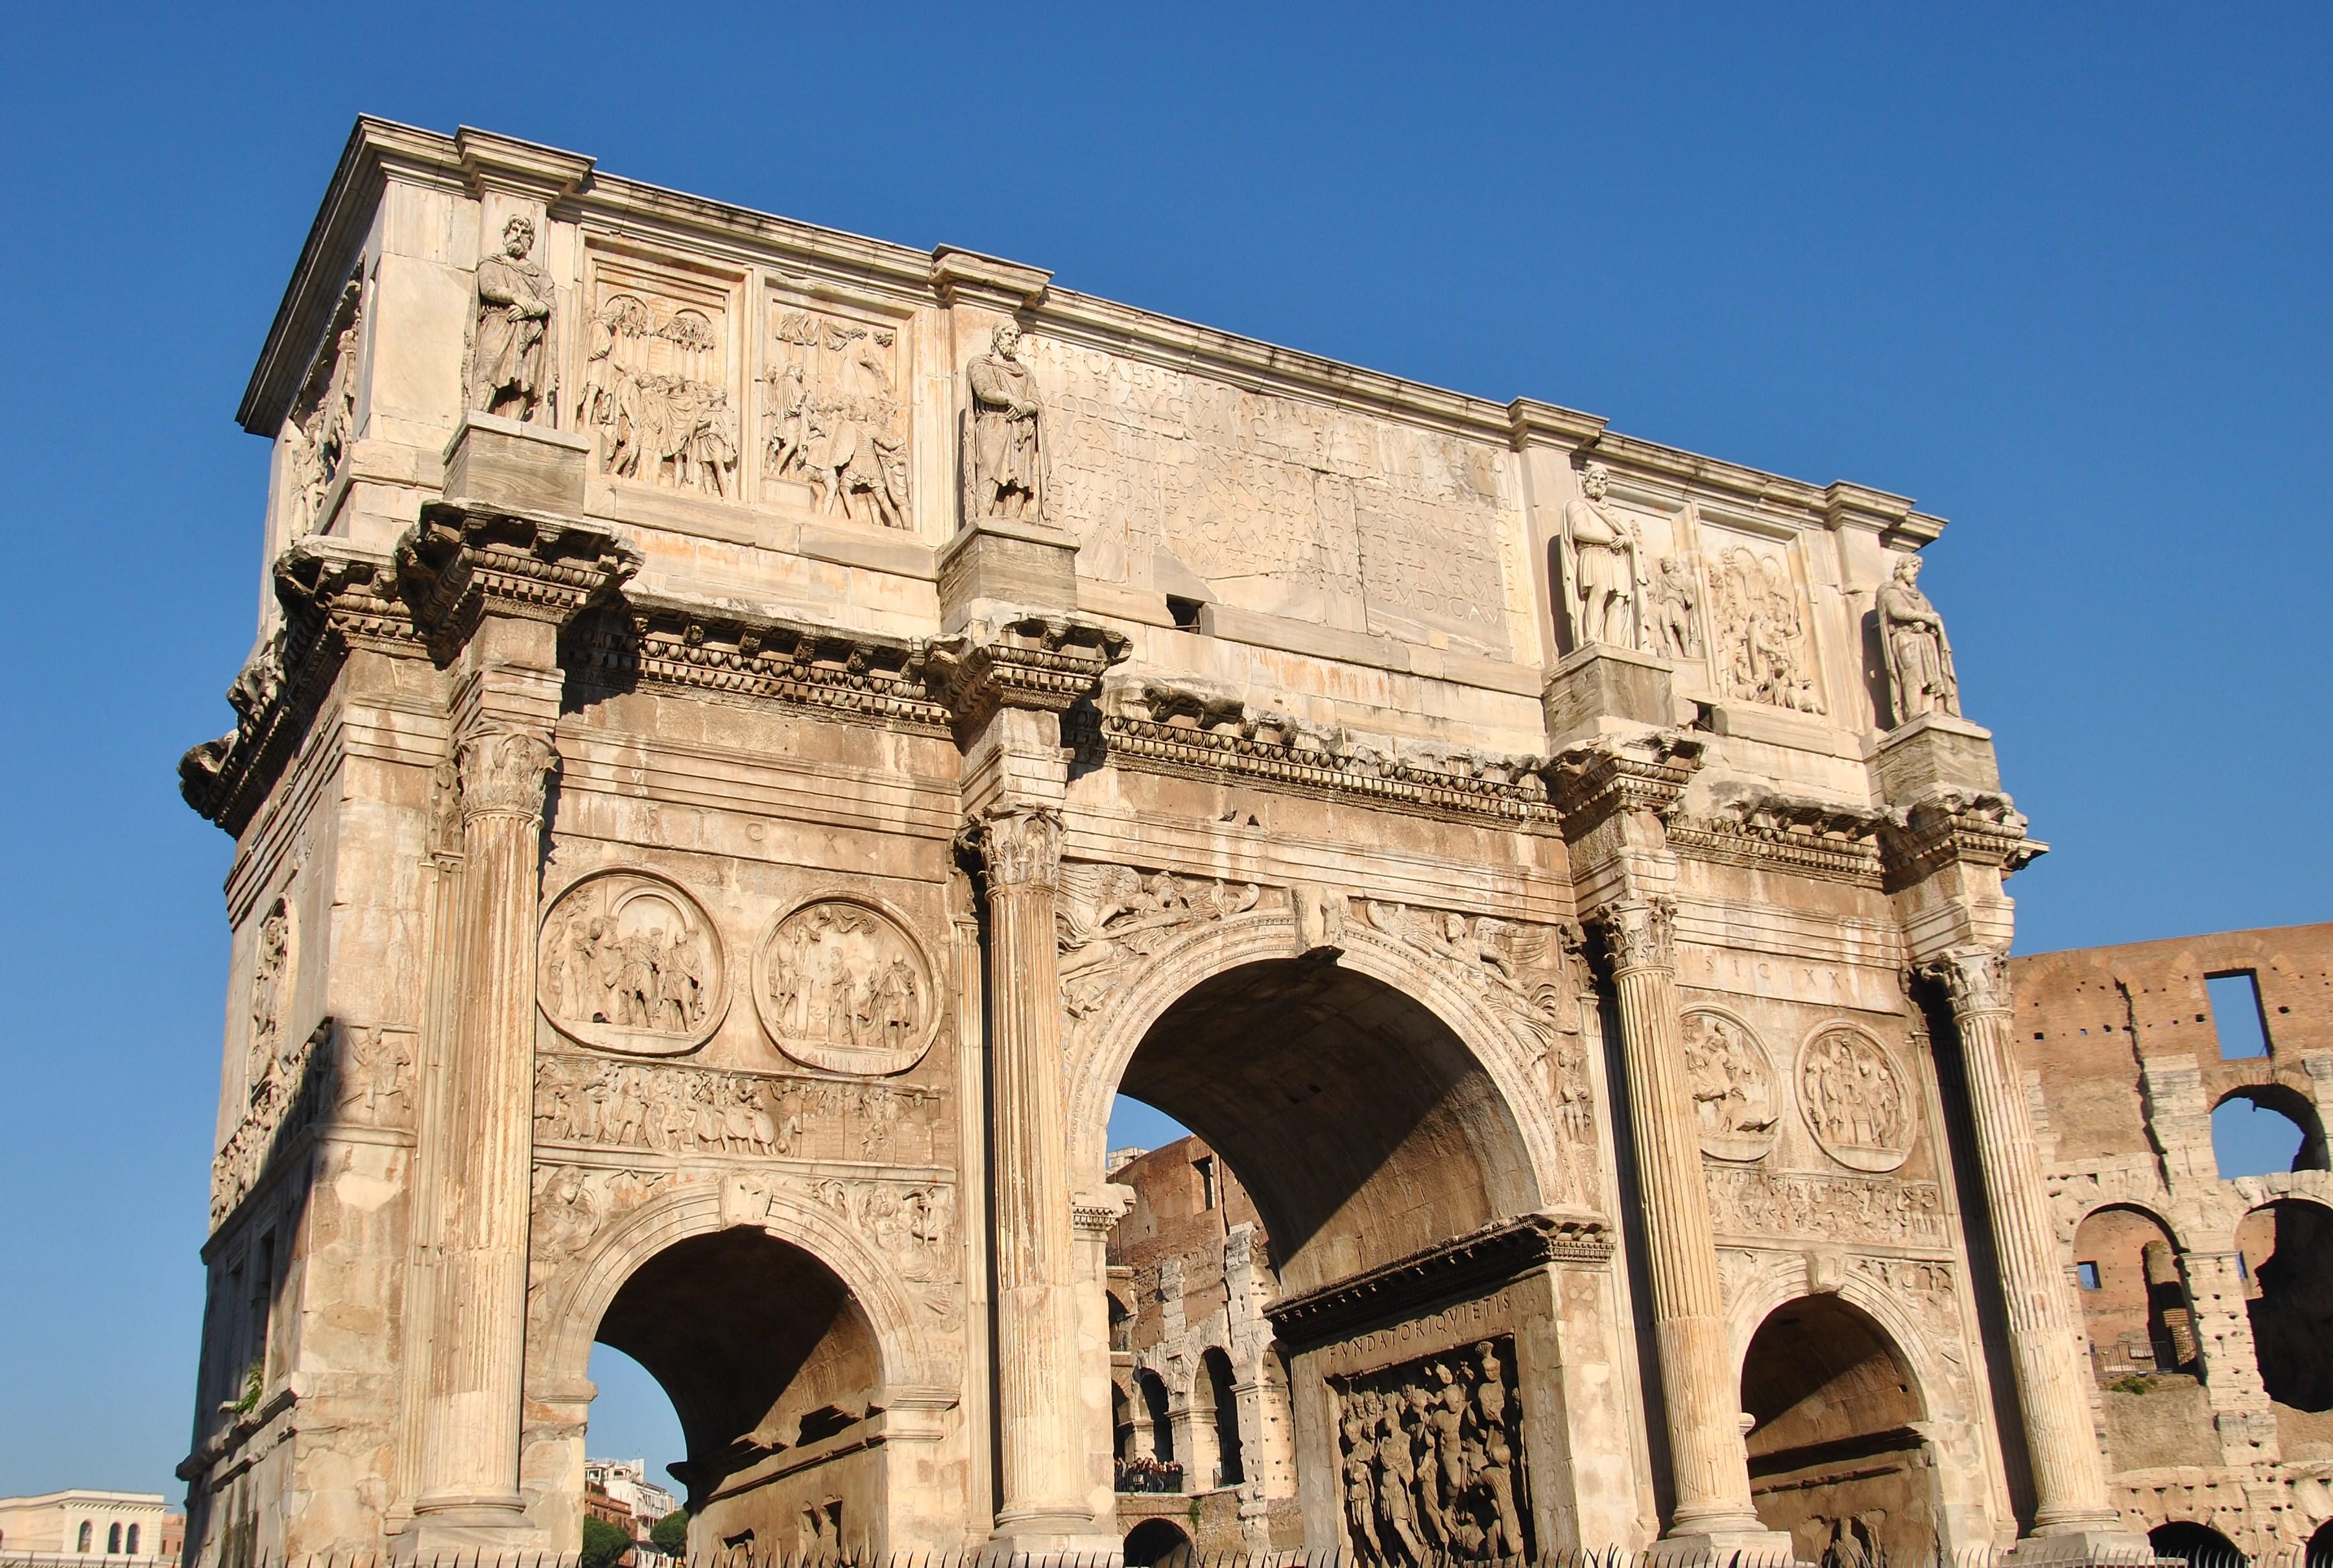 Рим. Блиц: арки и ворота